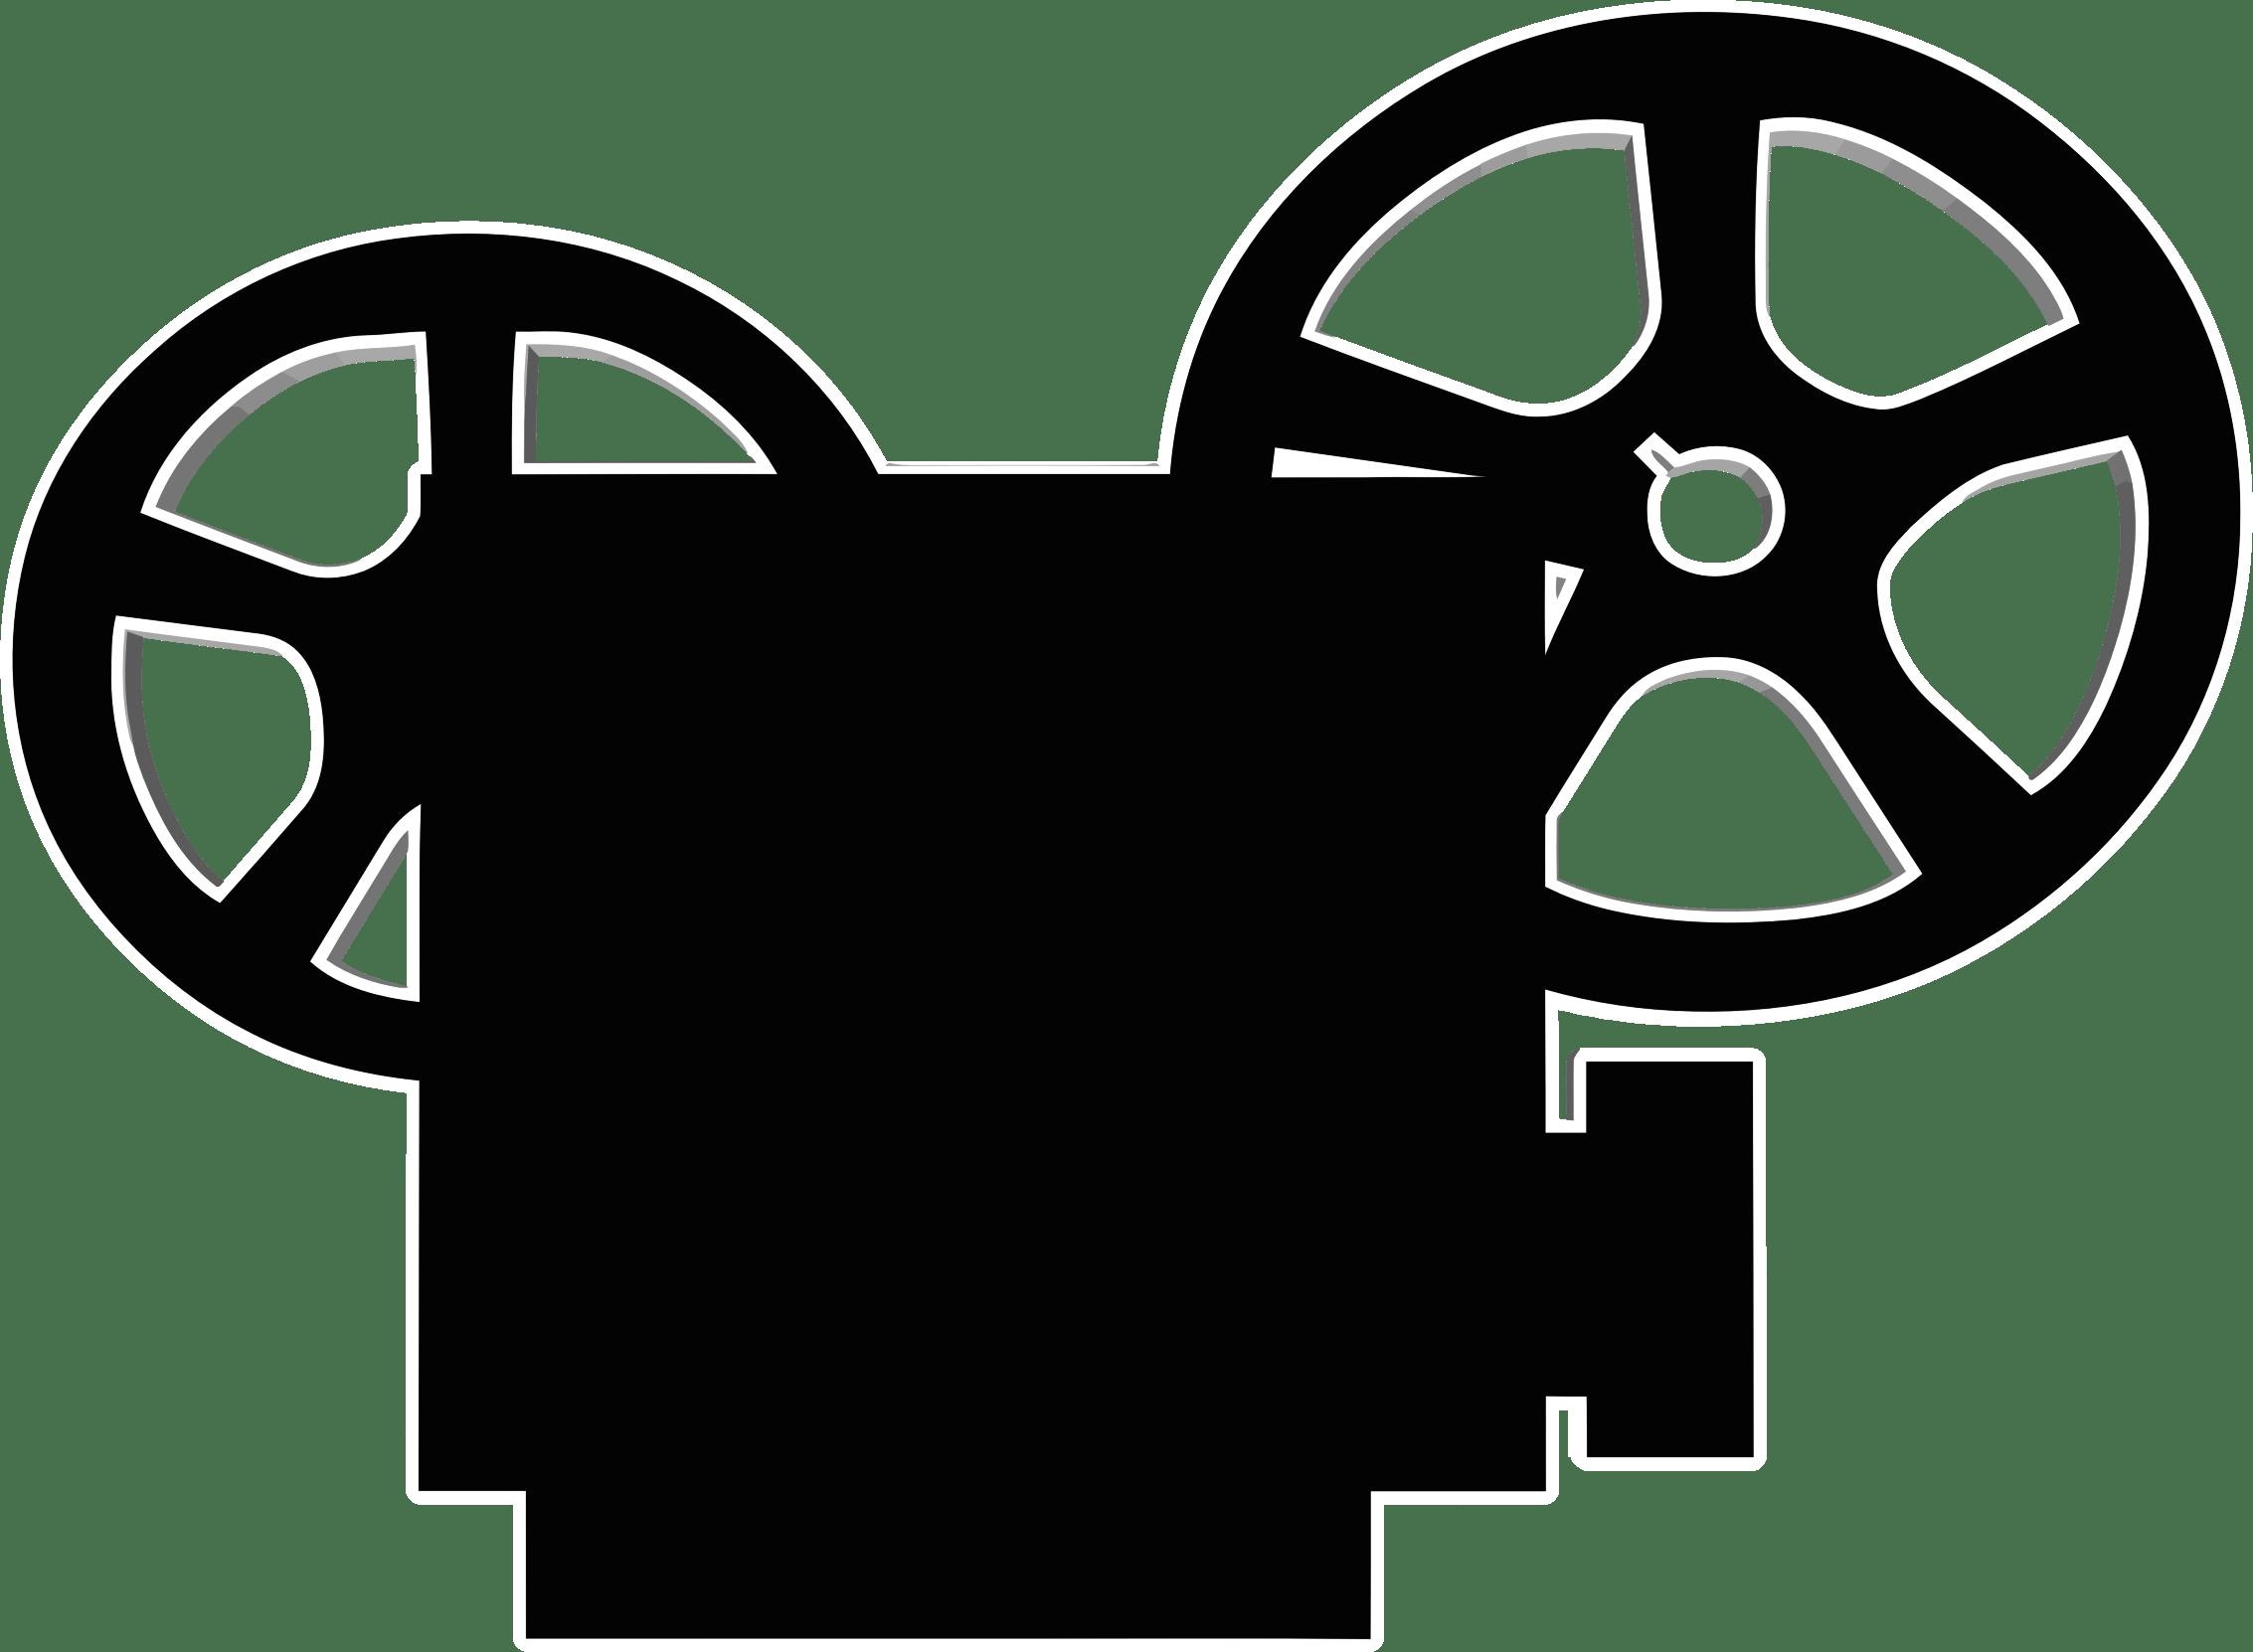 Movie clipart field trip. Projectors transparent png images